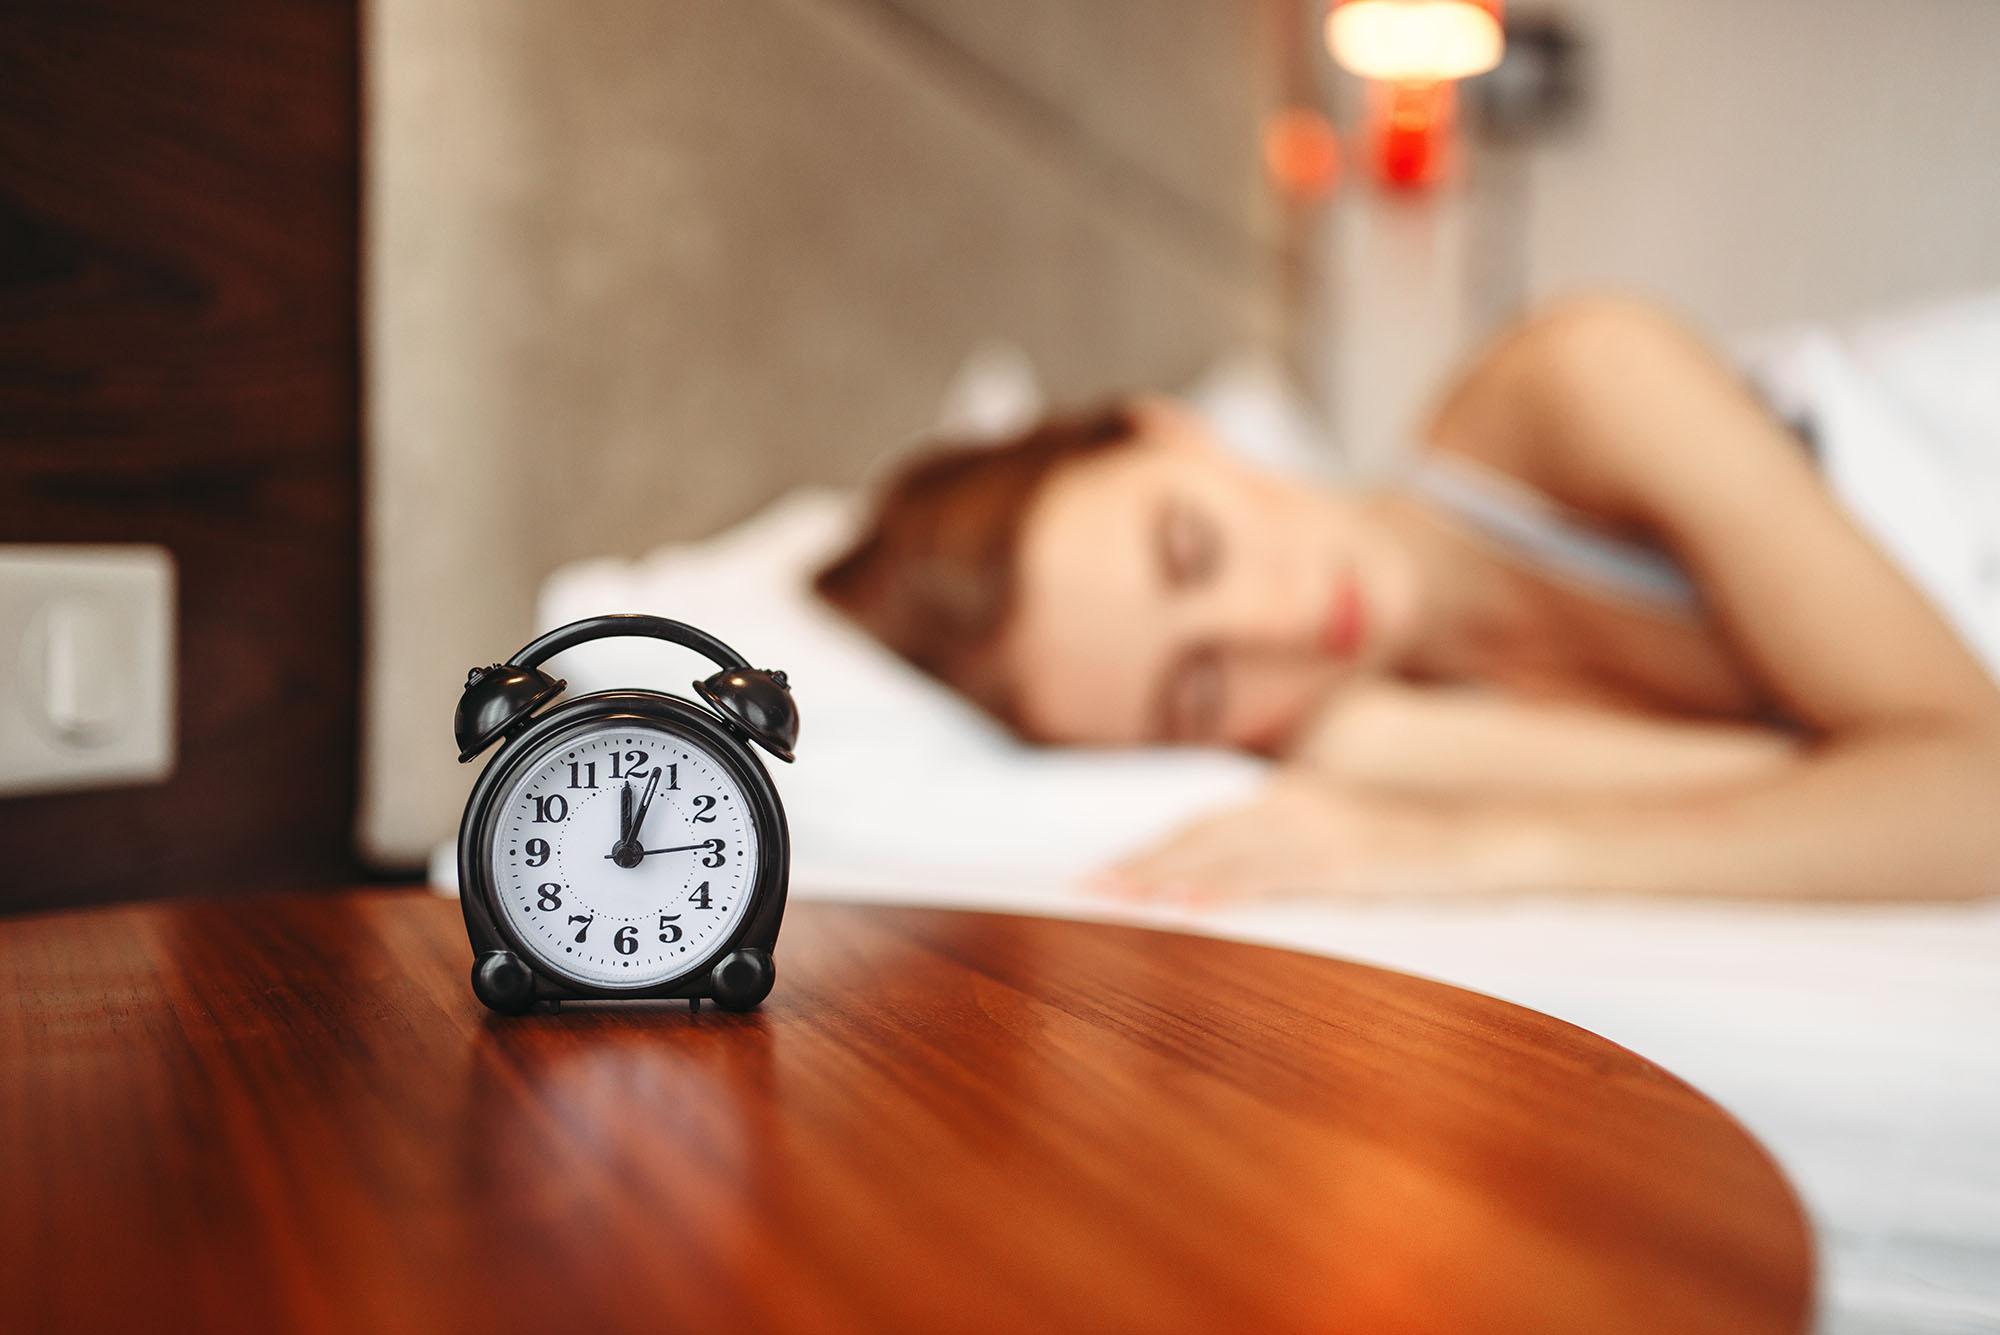 6 pasos para dormir mejor